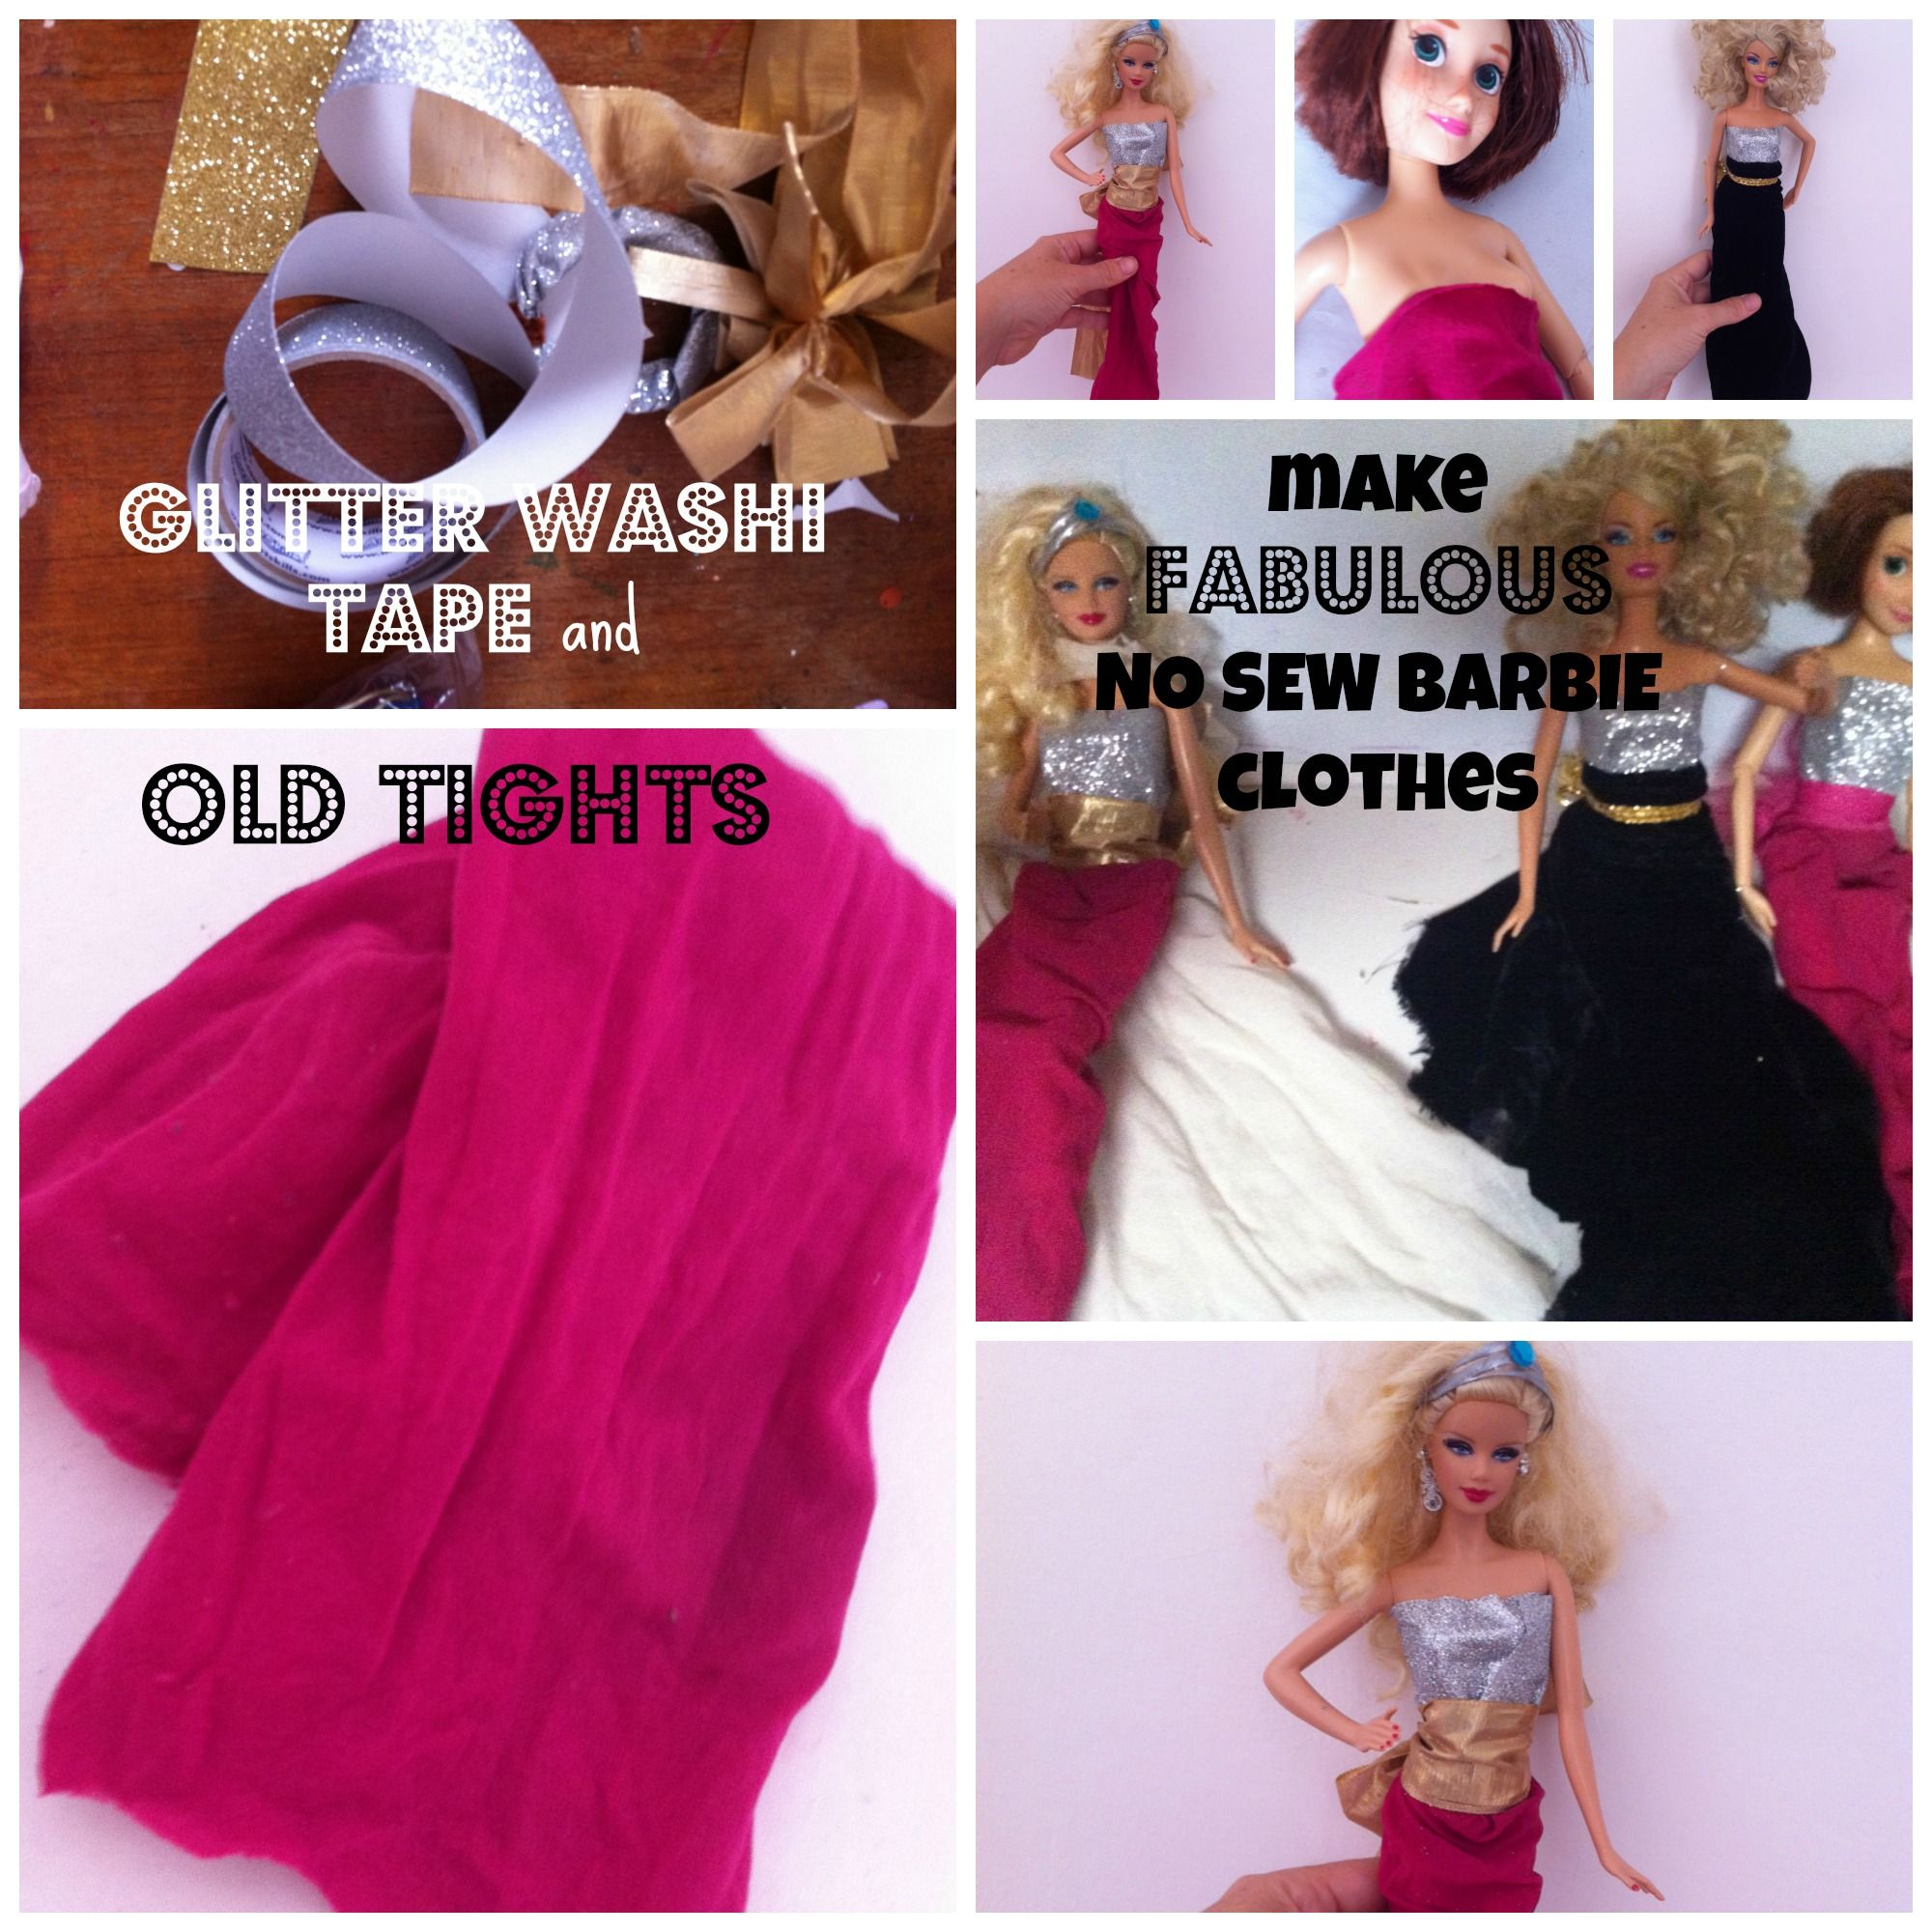 DIY no sew Barbie clothes kids' activity Sewing barbie